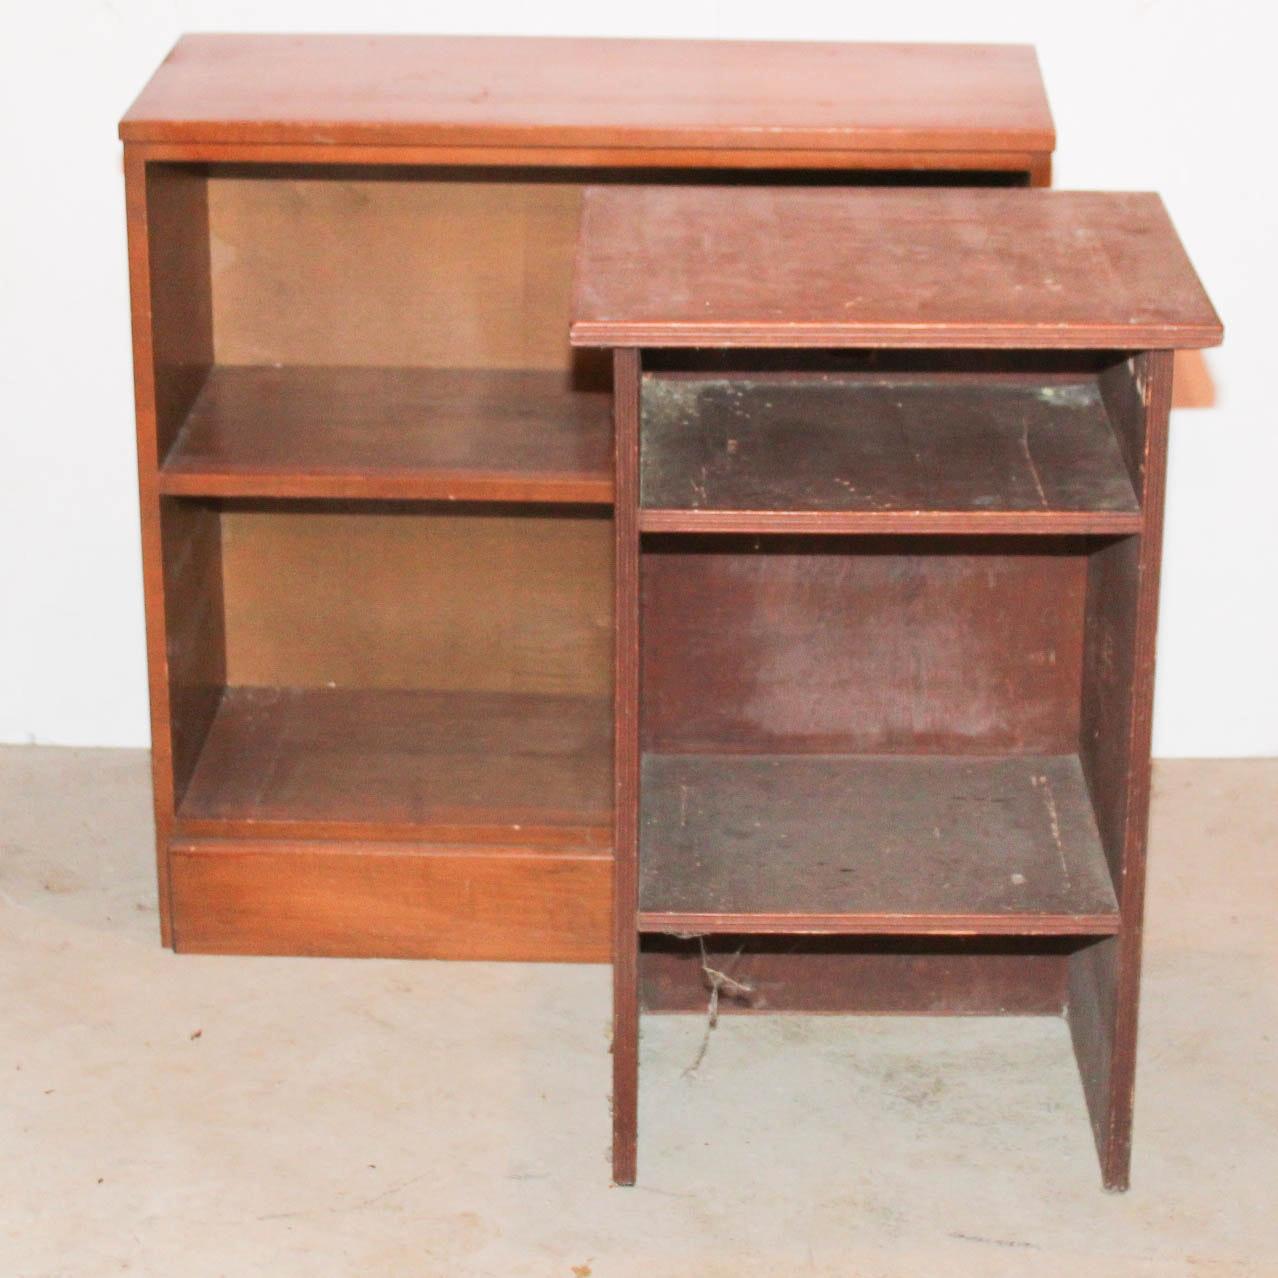 Vintage Solid Wood Bookshelves